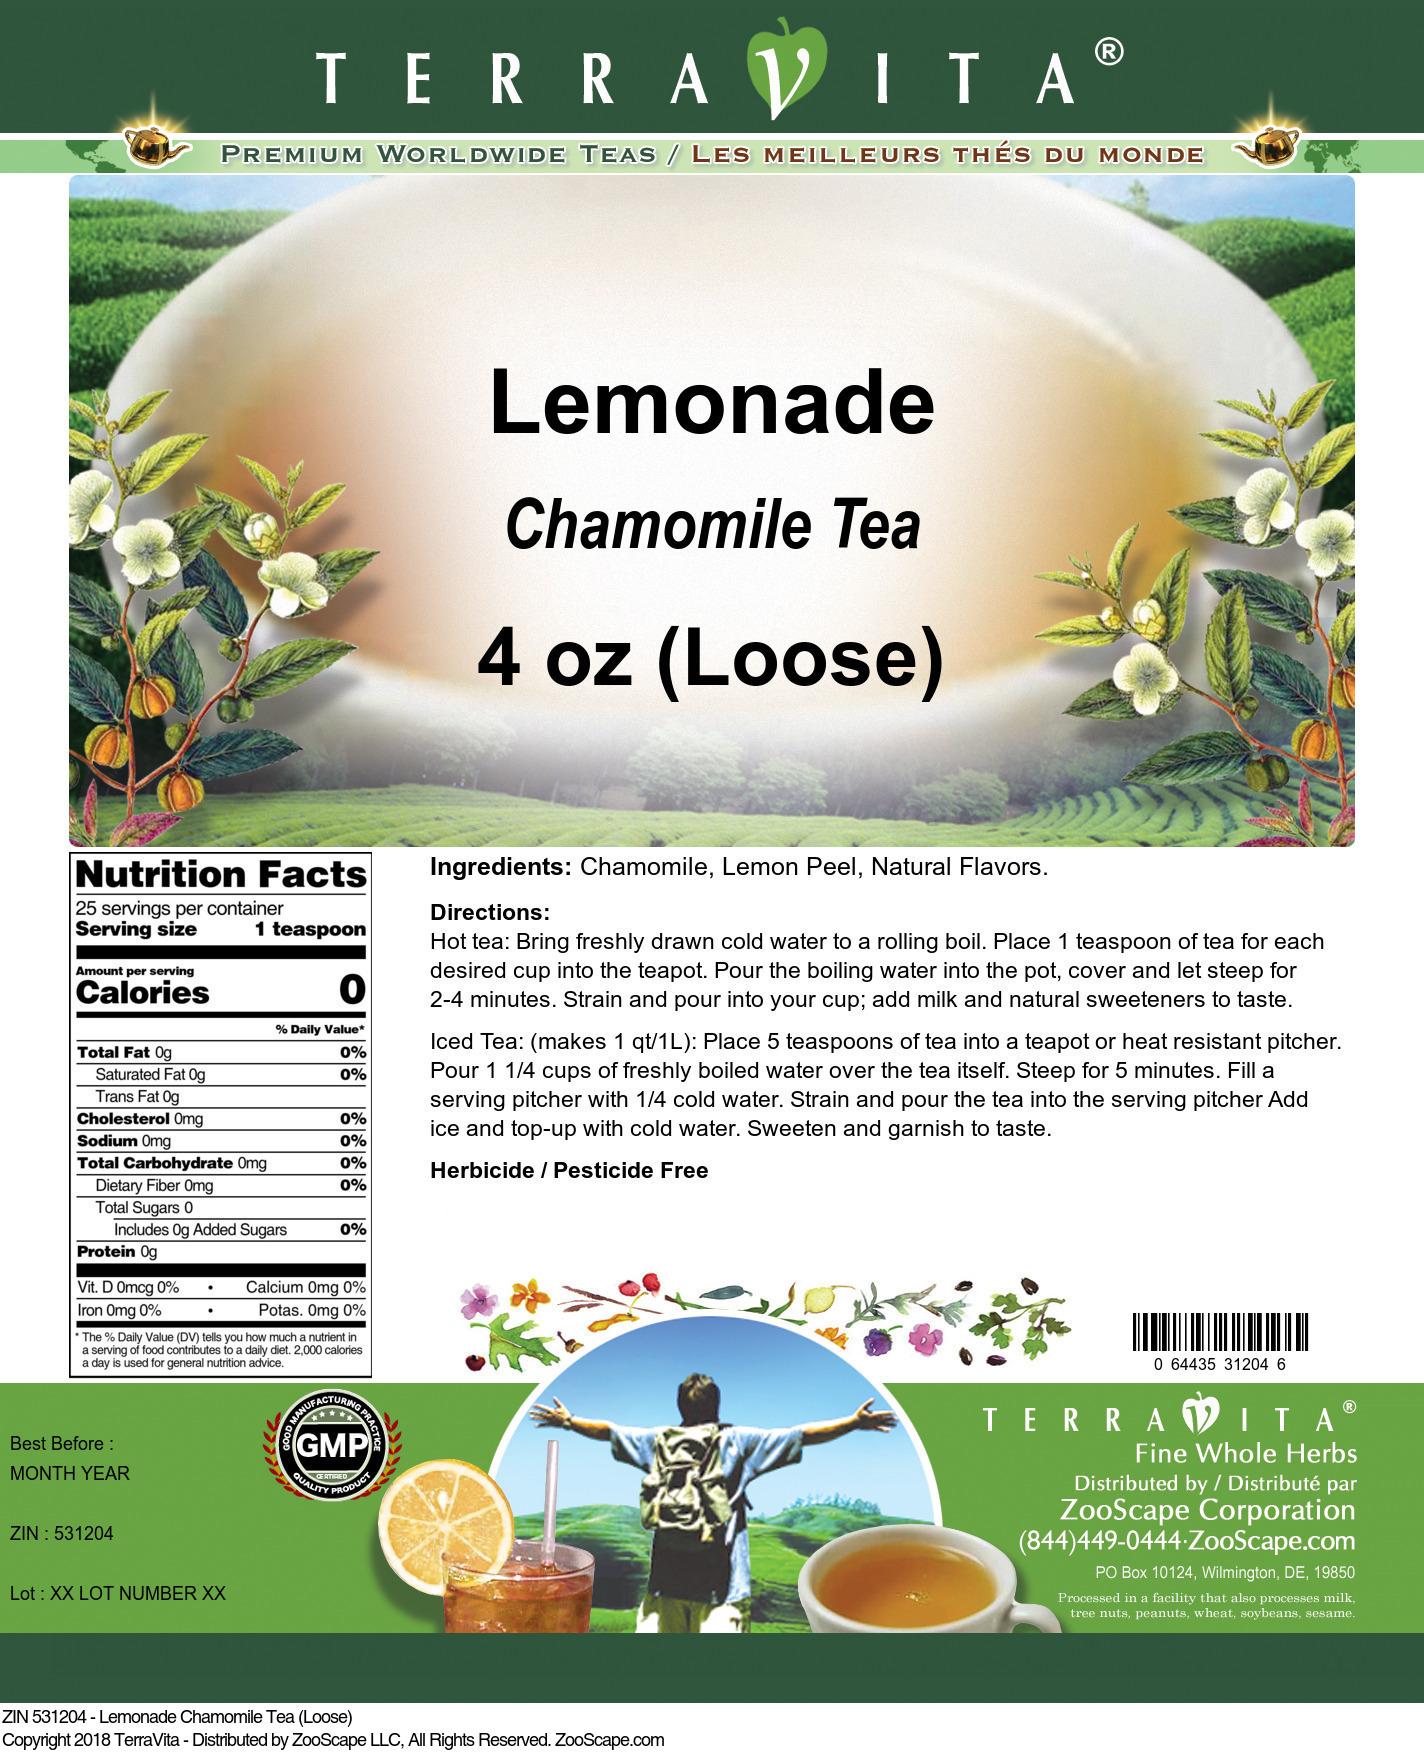 Lemonade Chamomile Tea (Loose)